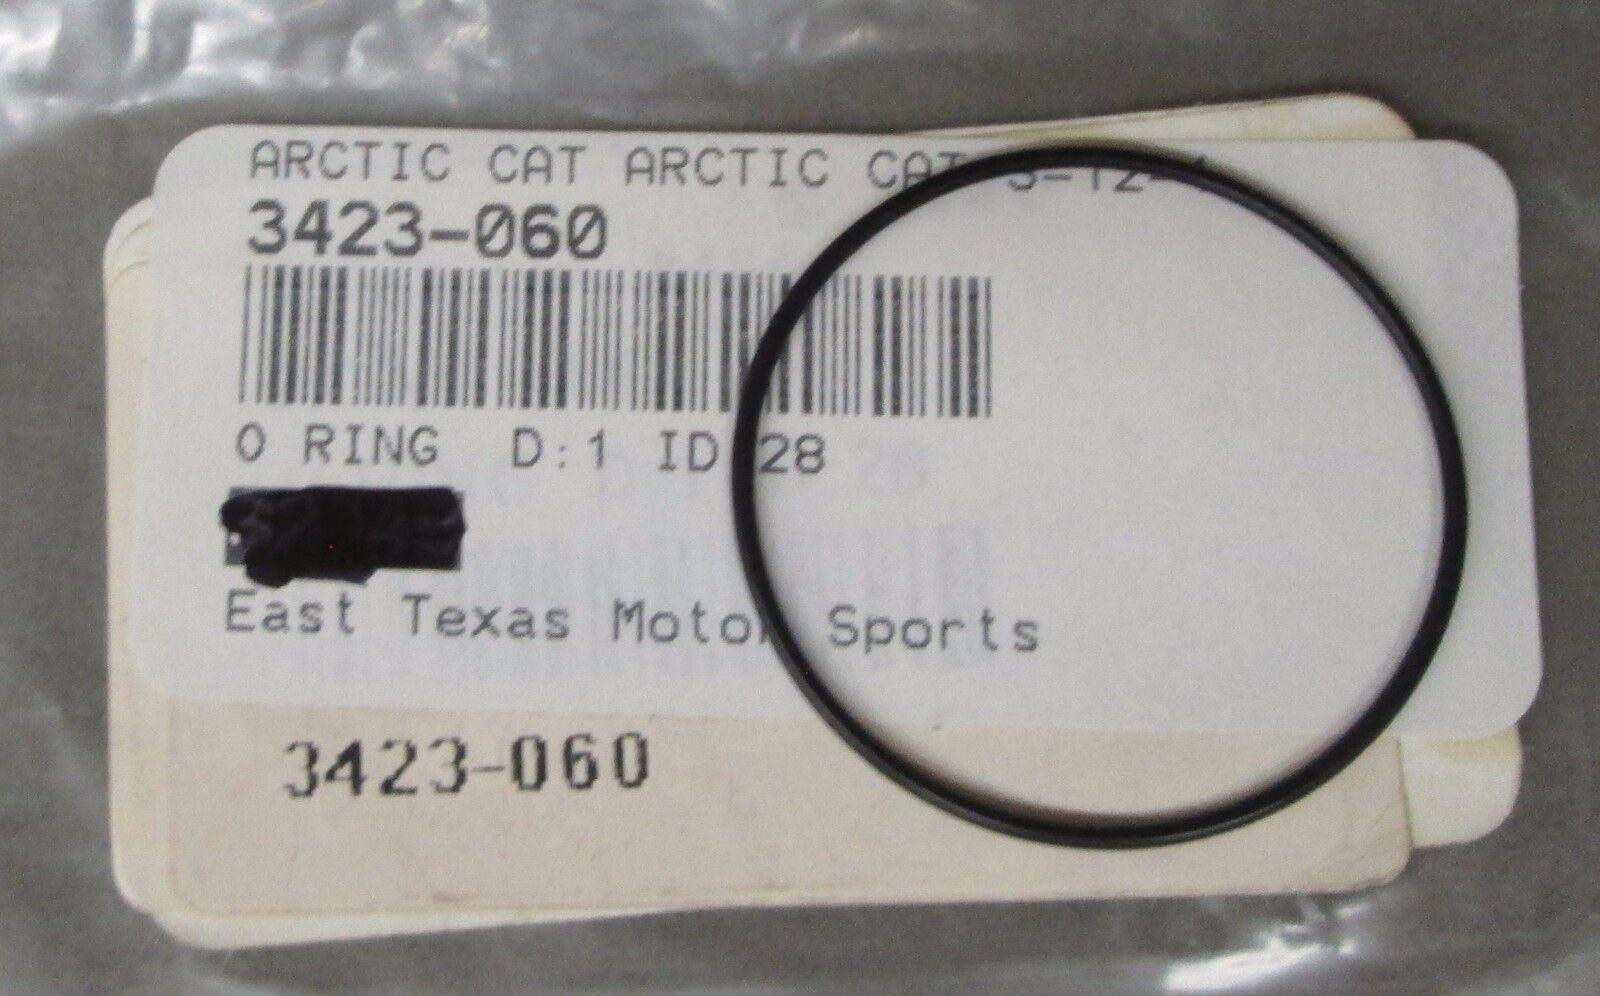 ARCTIC CAT 3423-060 OEM O-RING D:1 ID:28 FITS 01-05 250 4X4/00-02 500 4X4 & MORE